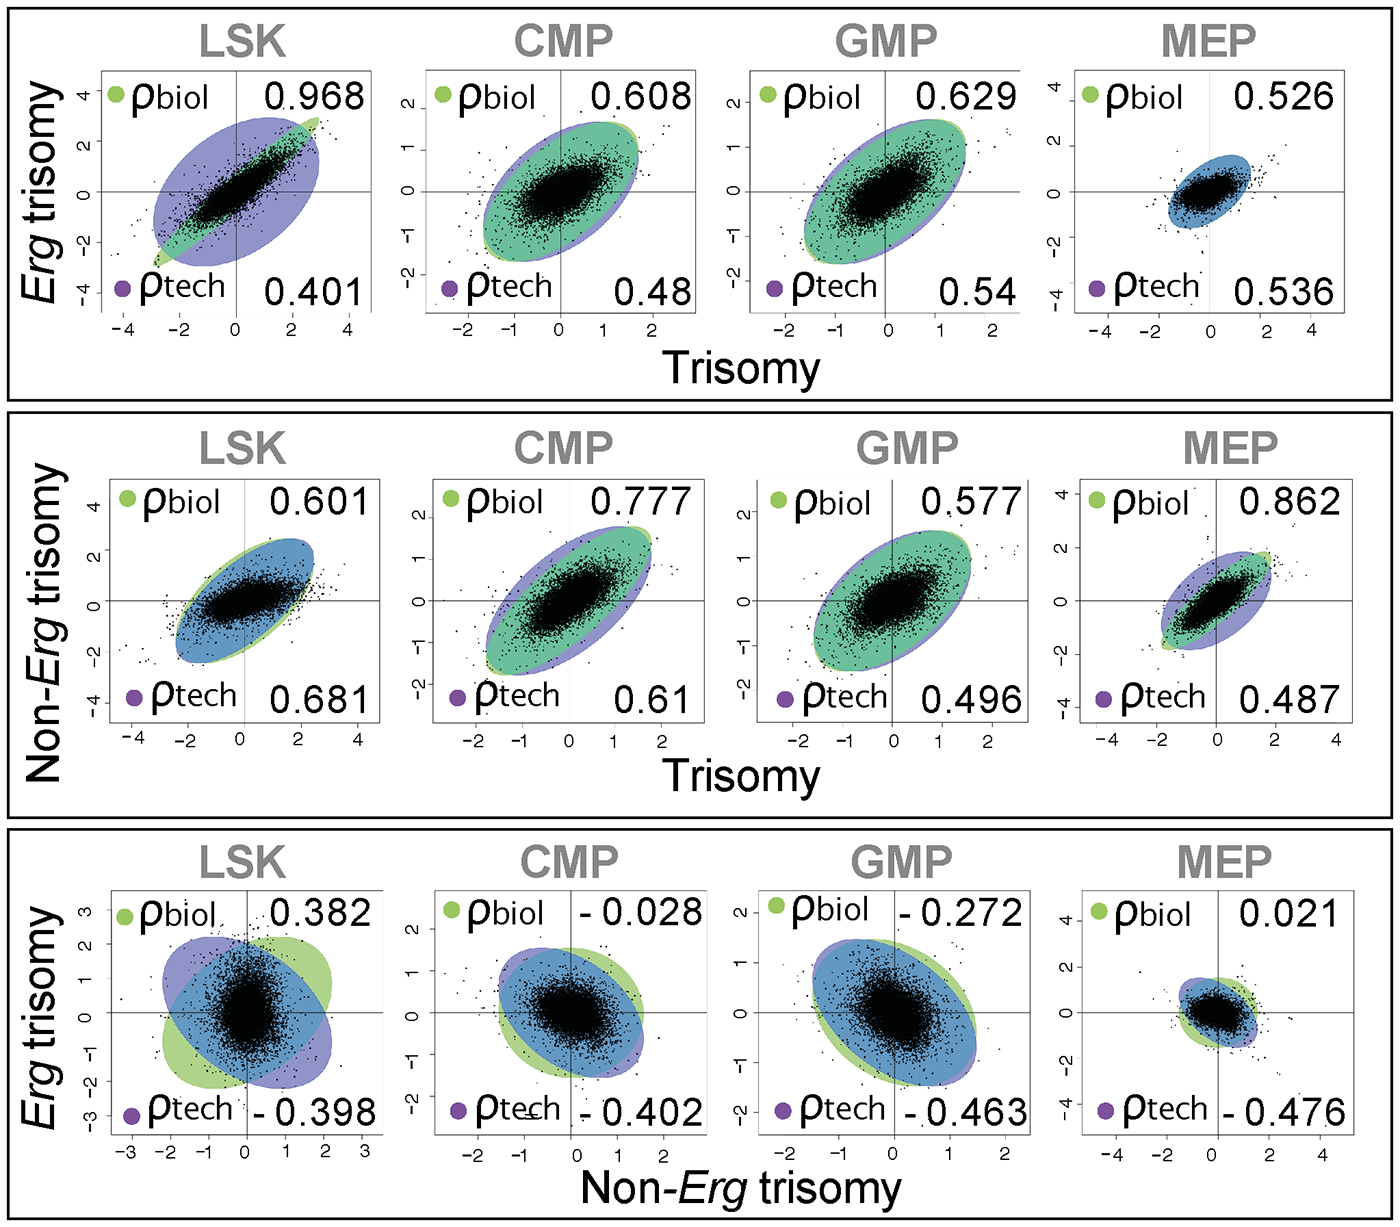 Biological correlation of gene expression changes using gene association analysis.